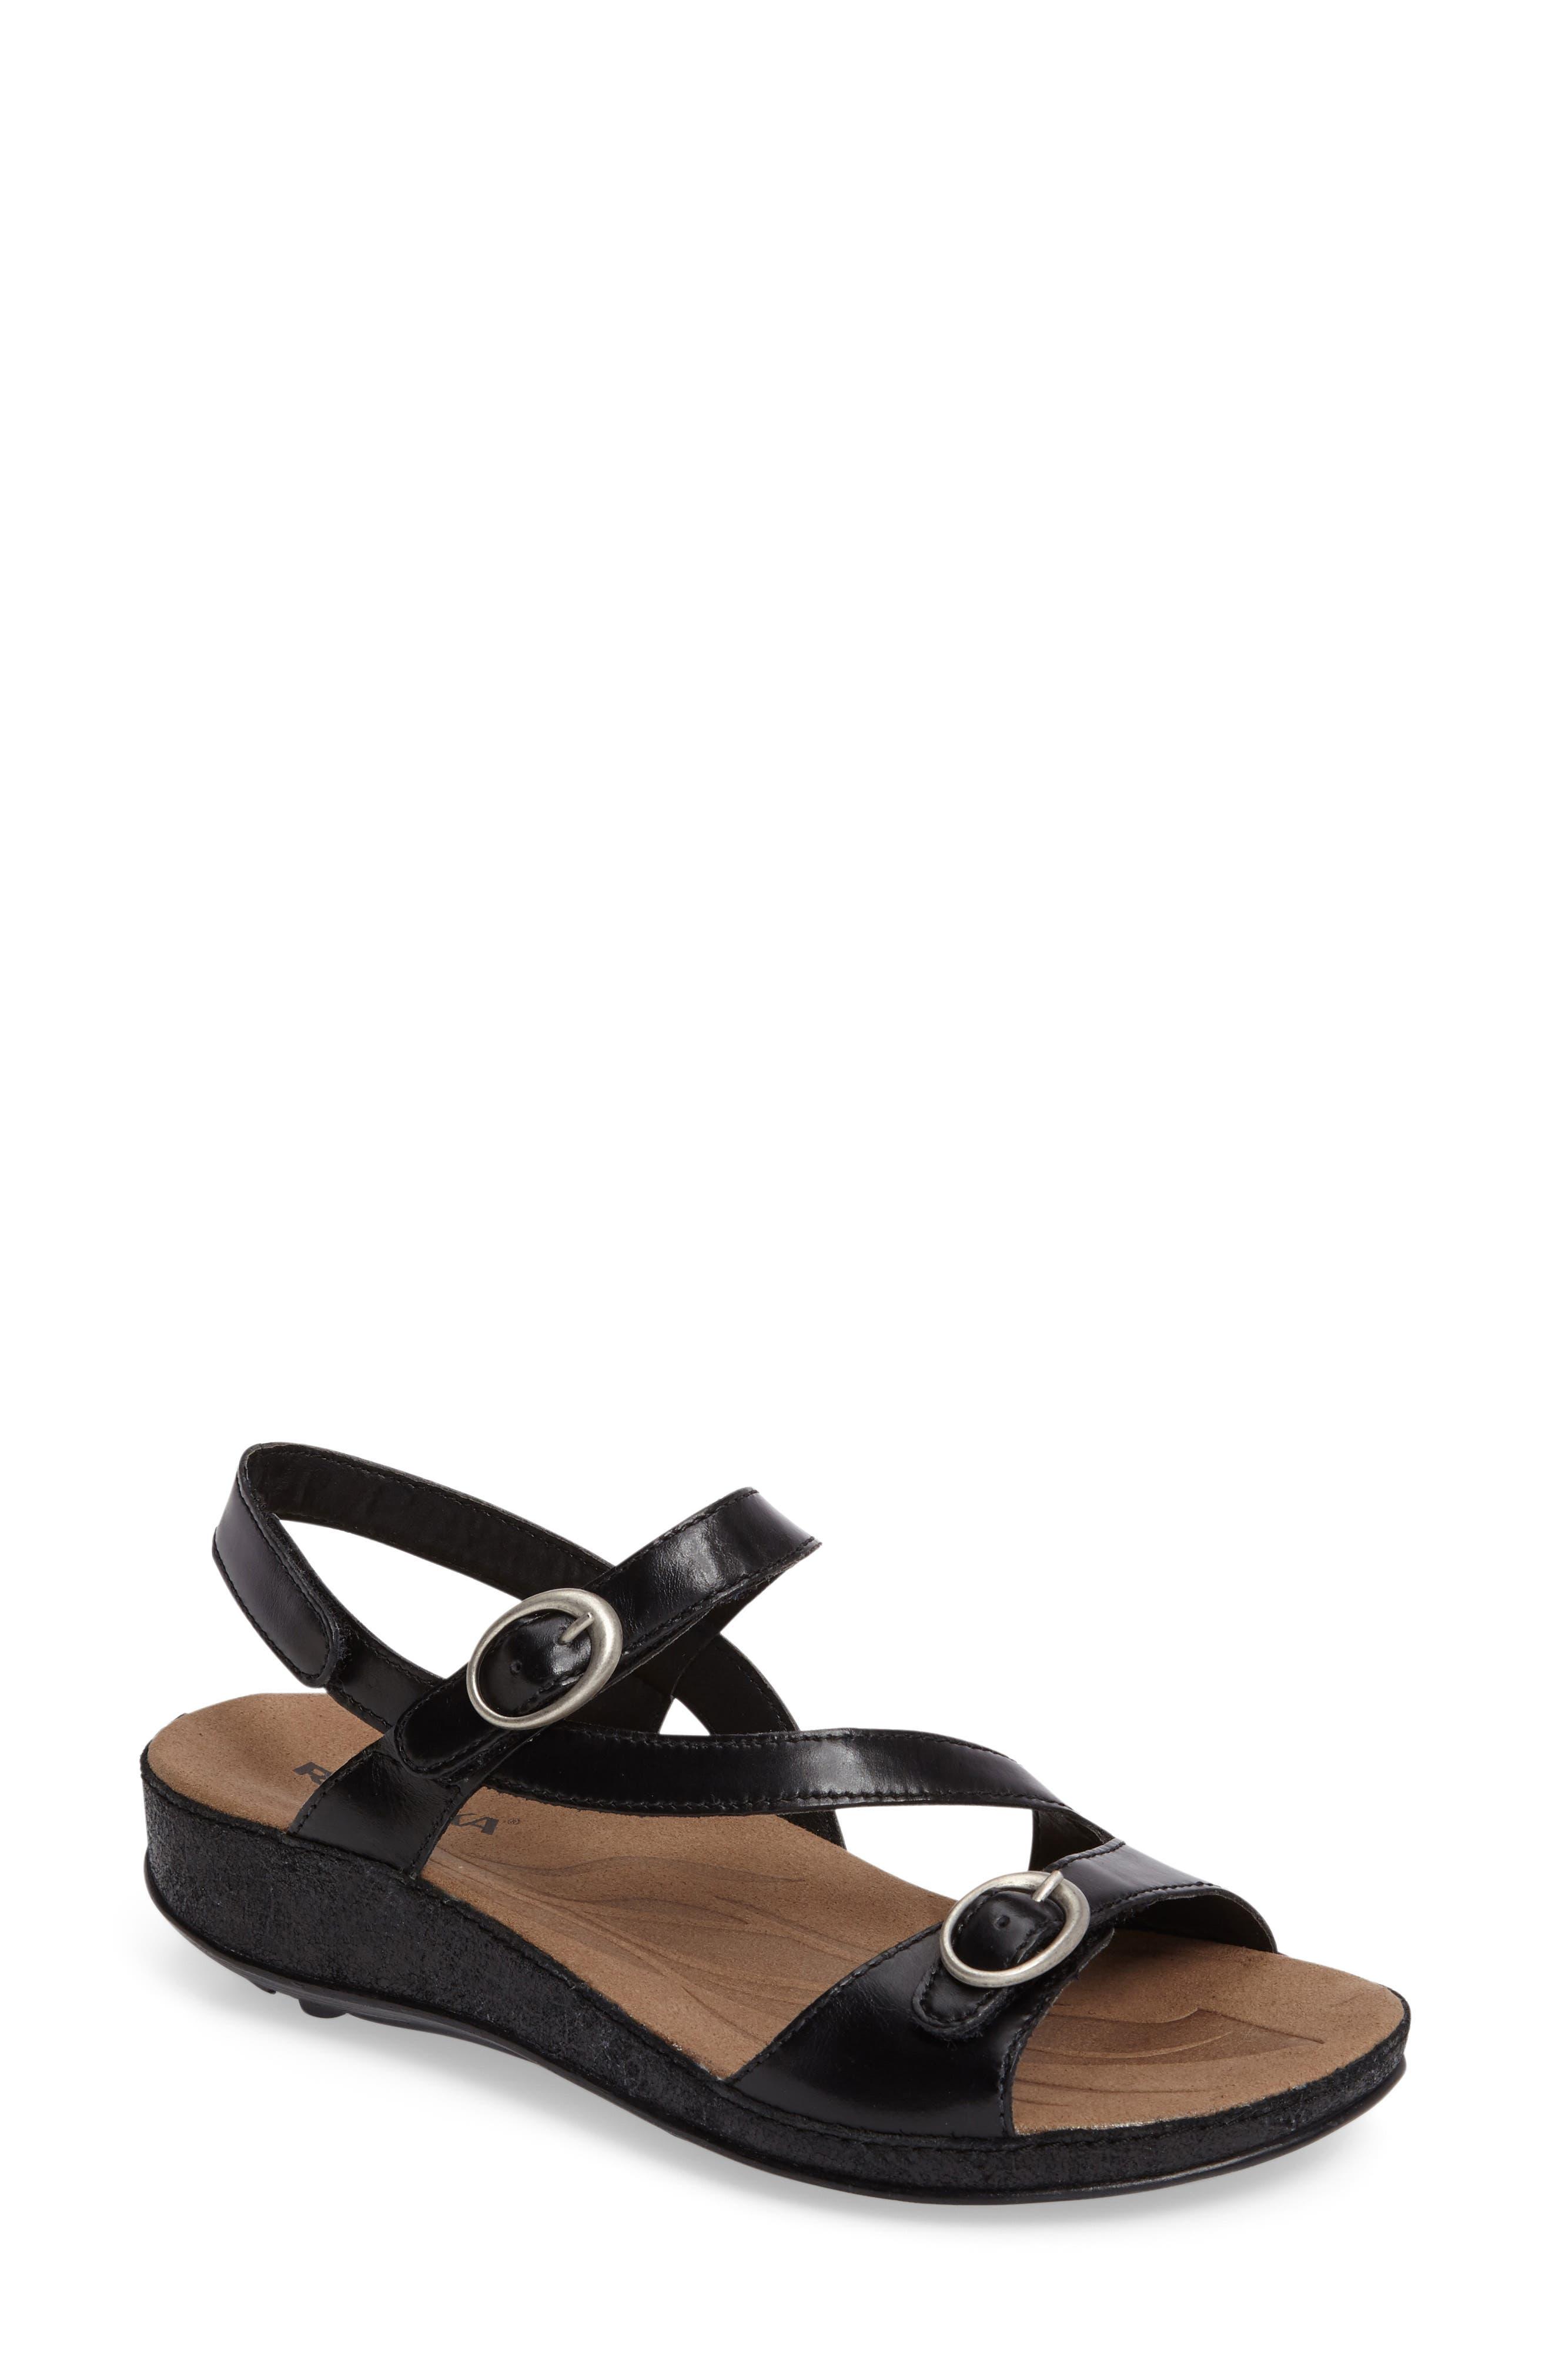 Fidschi 48 Sandal,                         Main,                         color, 001